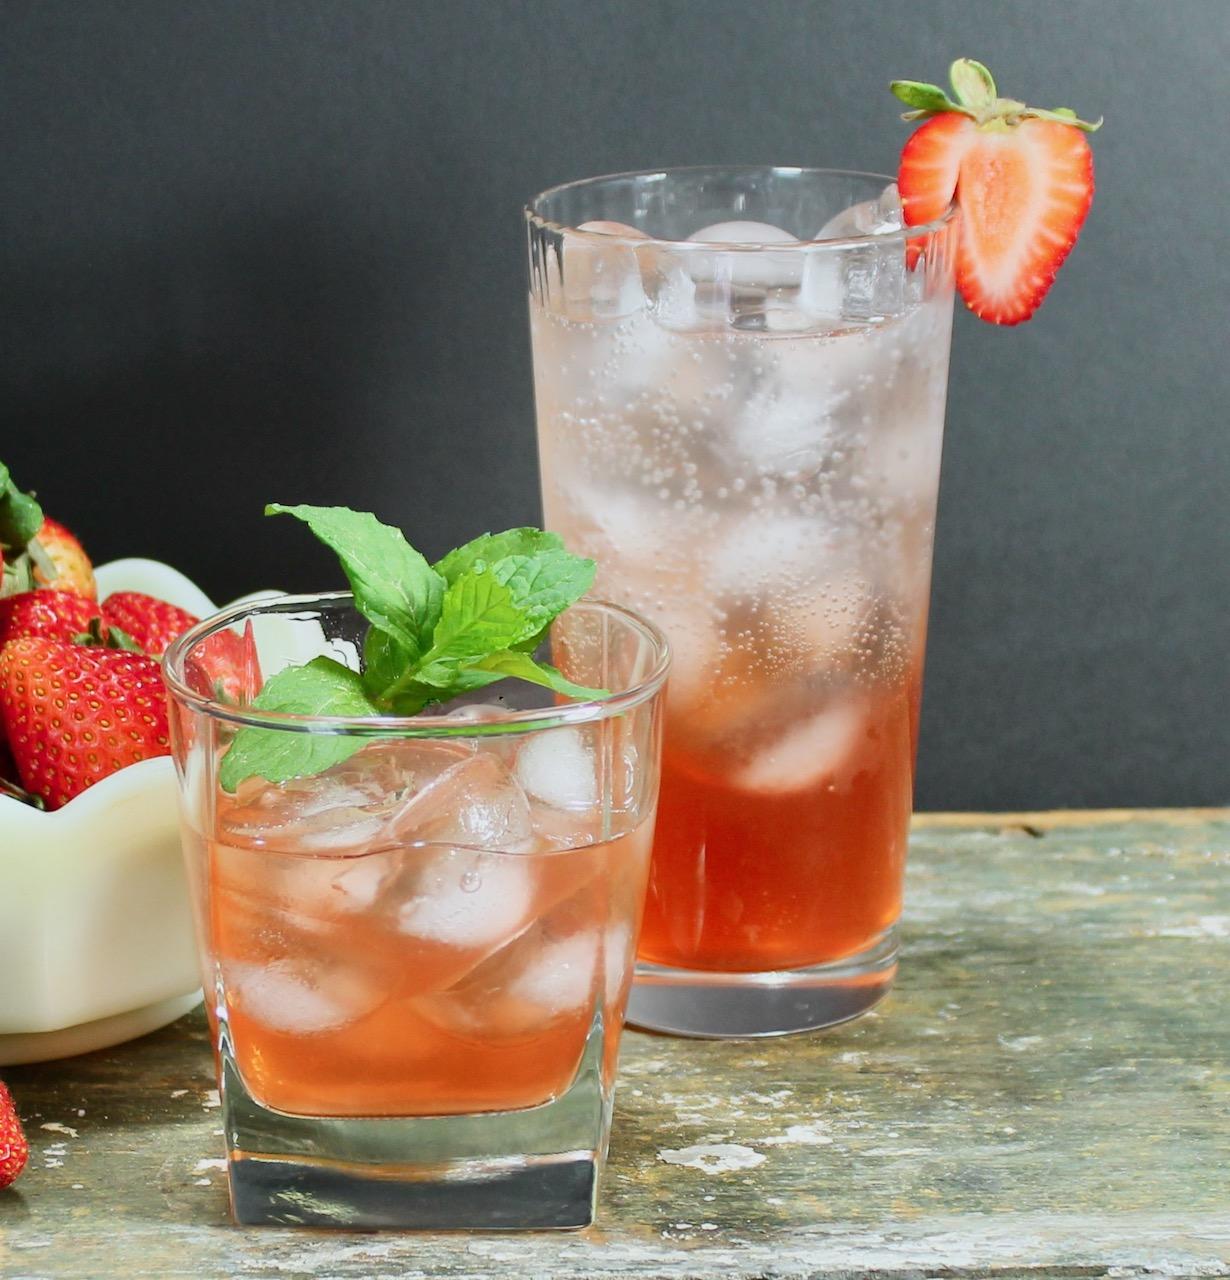 strawberry shrub gin cocktail